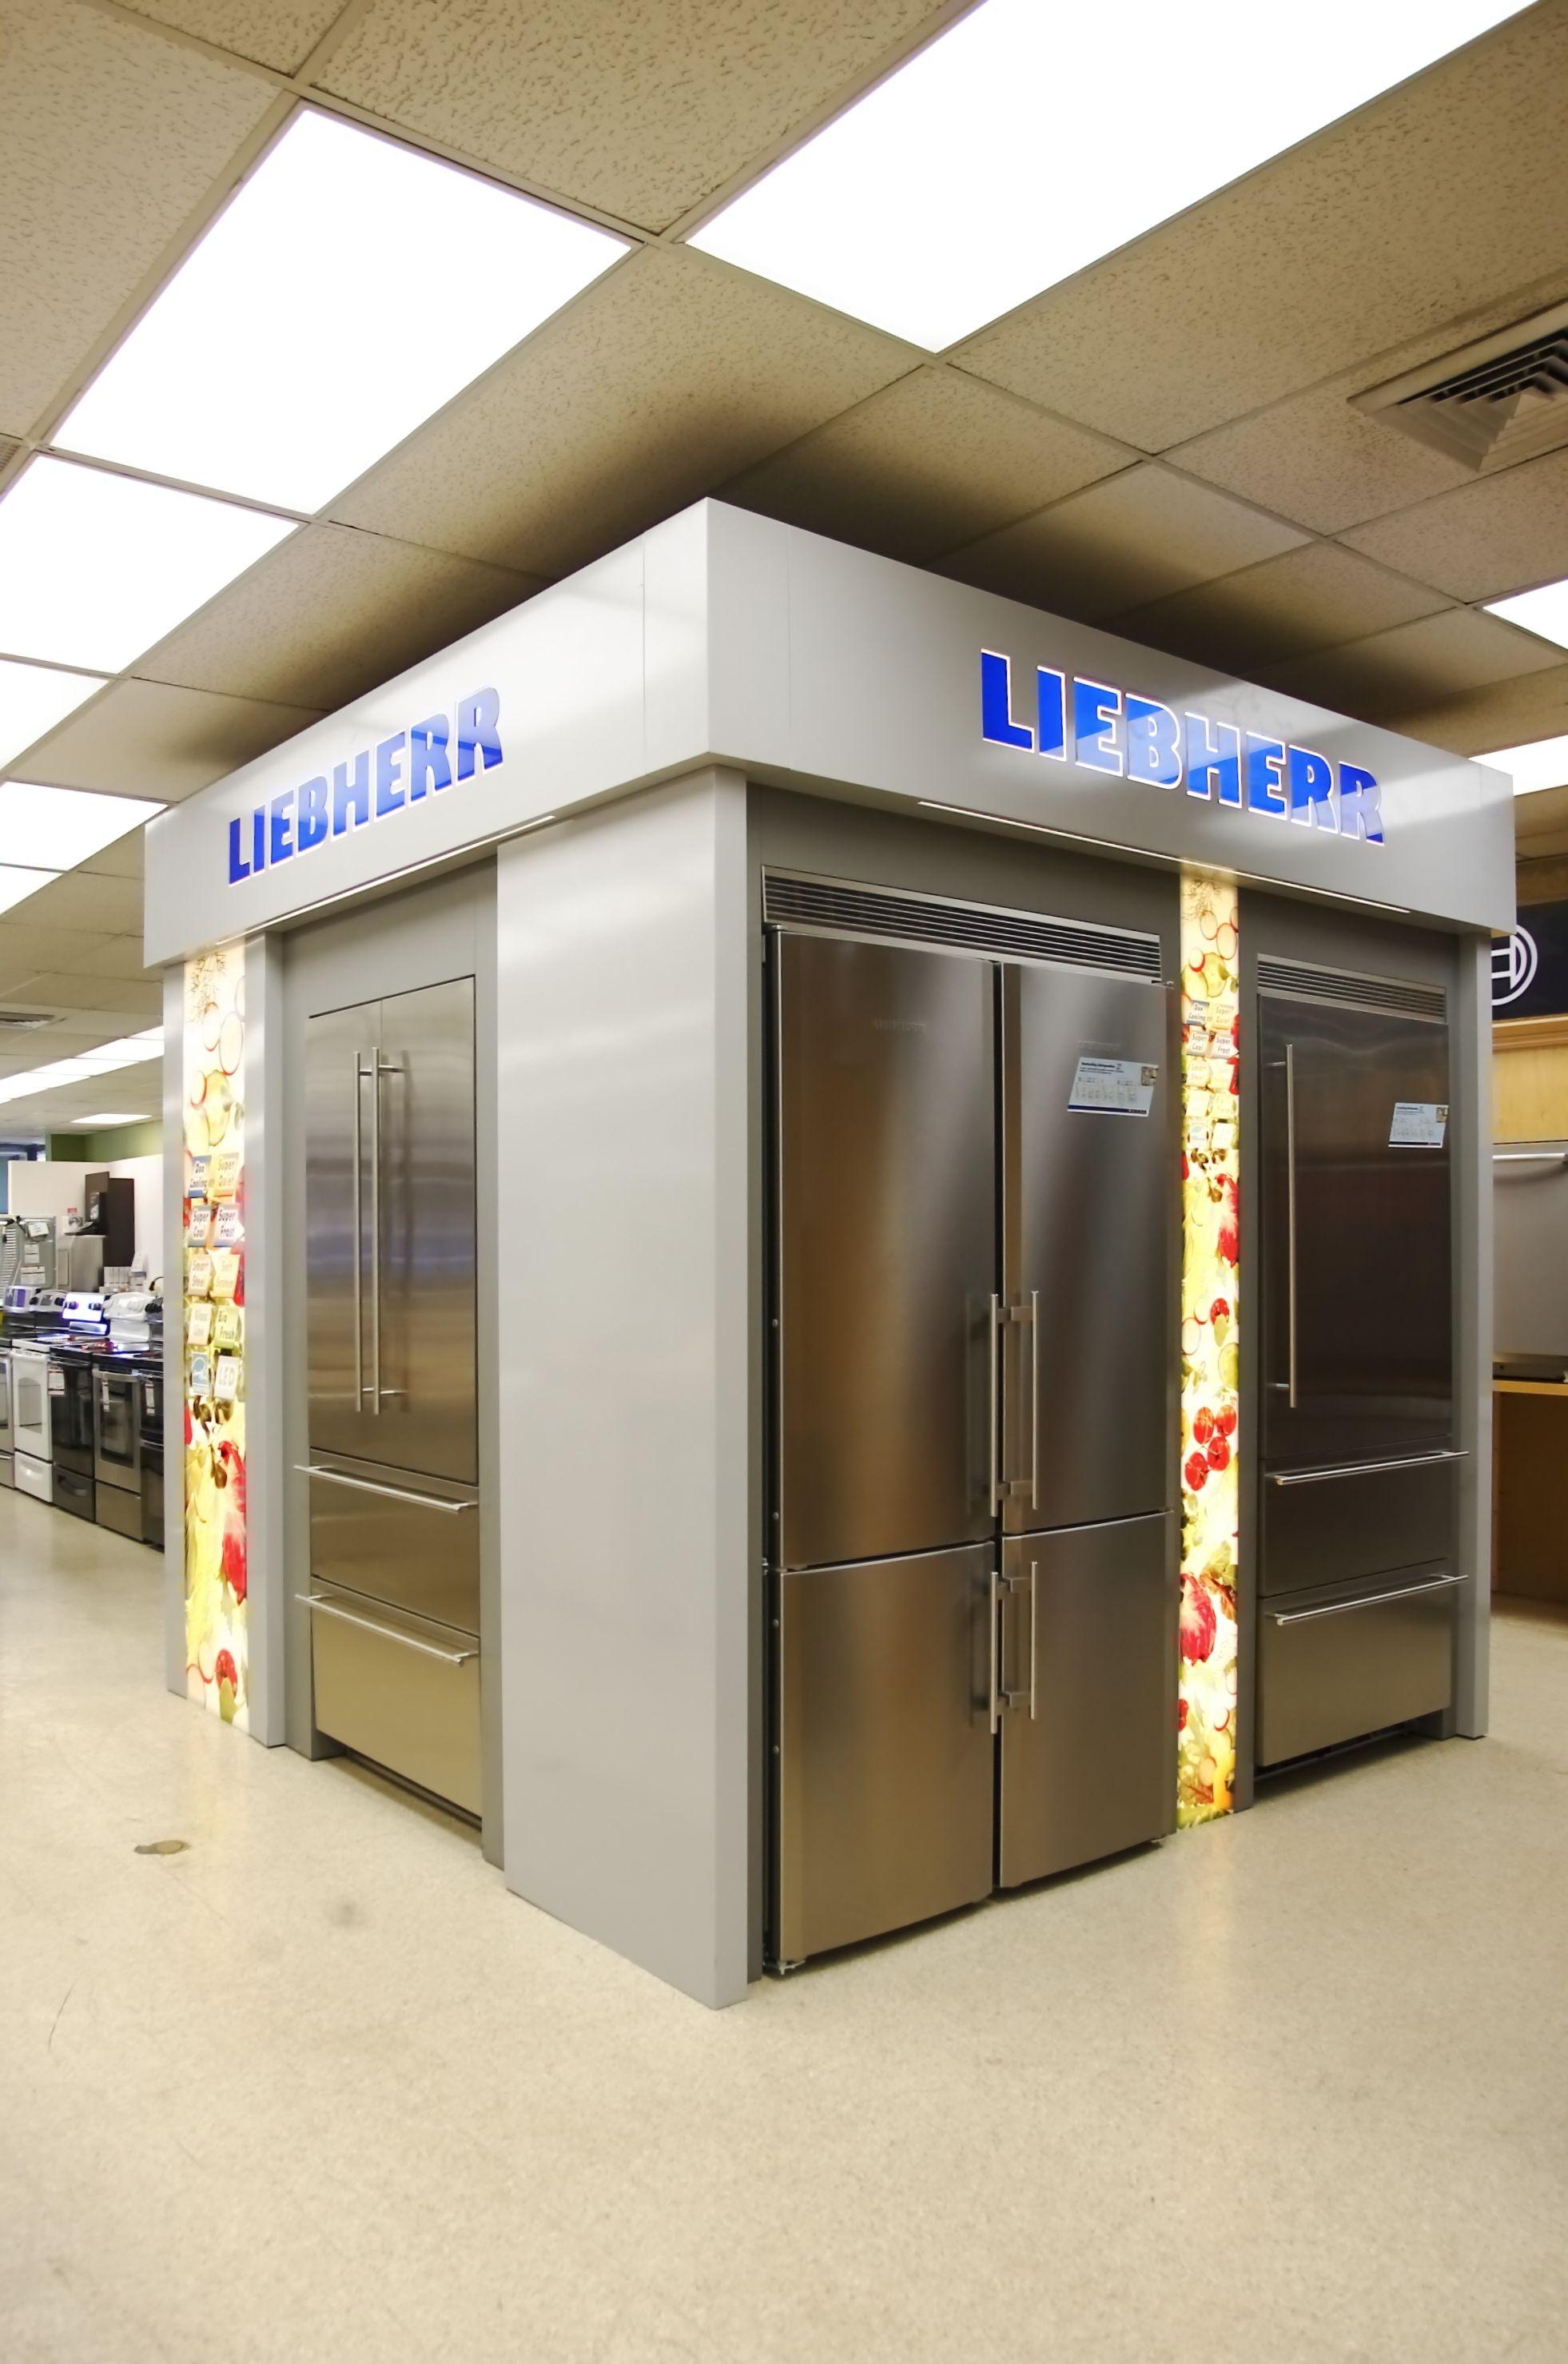 Lawrence Township Nj Refrigerator French Door Refrigerator